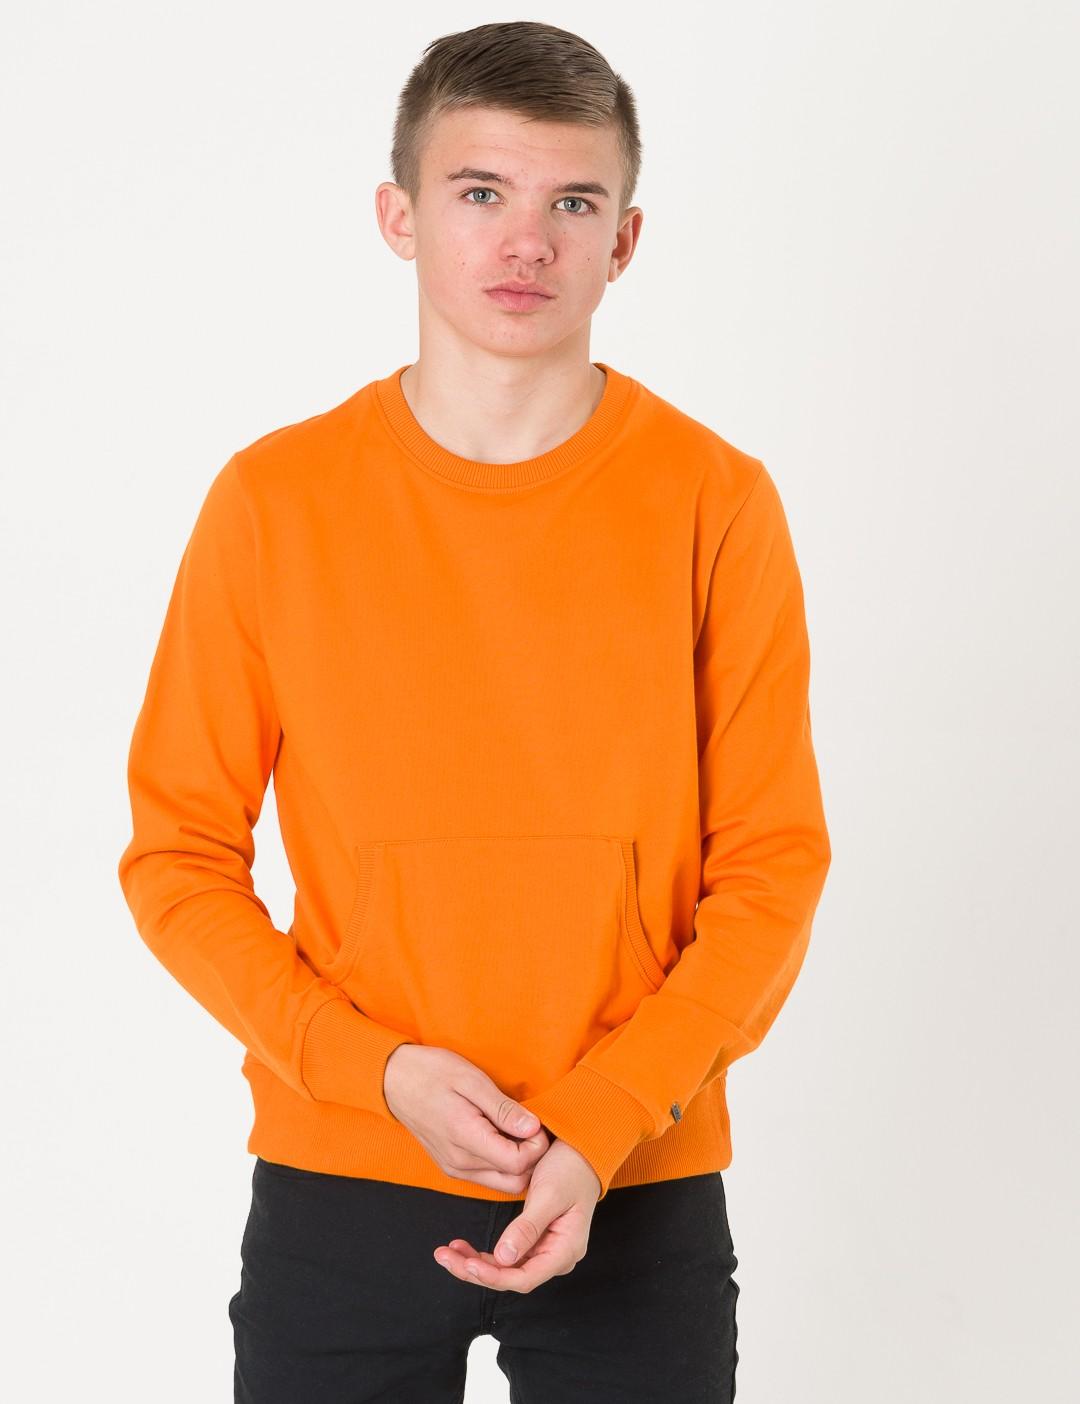 2f9e7c2fe24c Om Sean College - Orange från Way Ink   KidsBrandStore